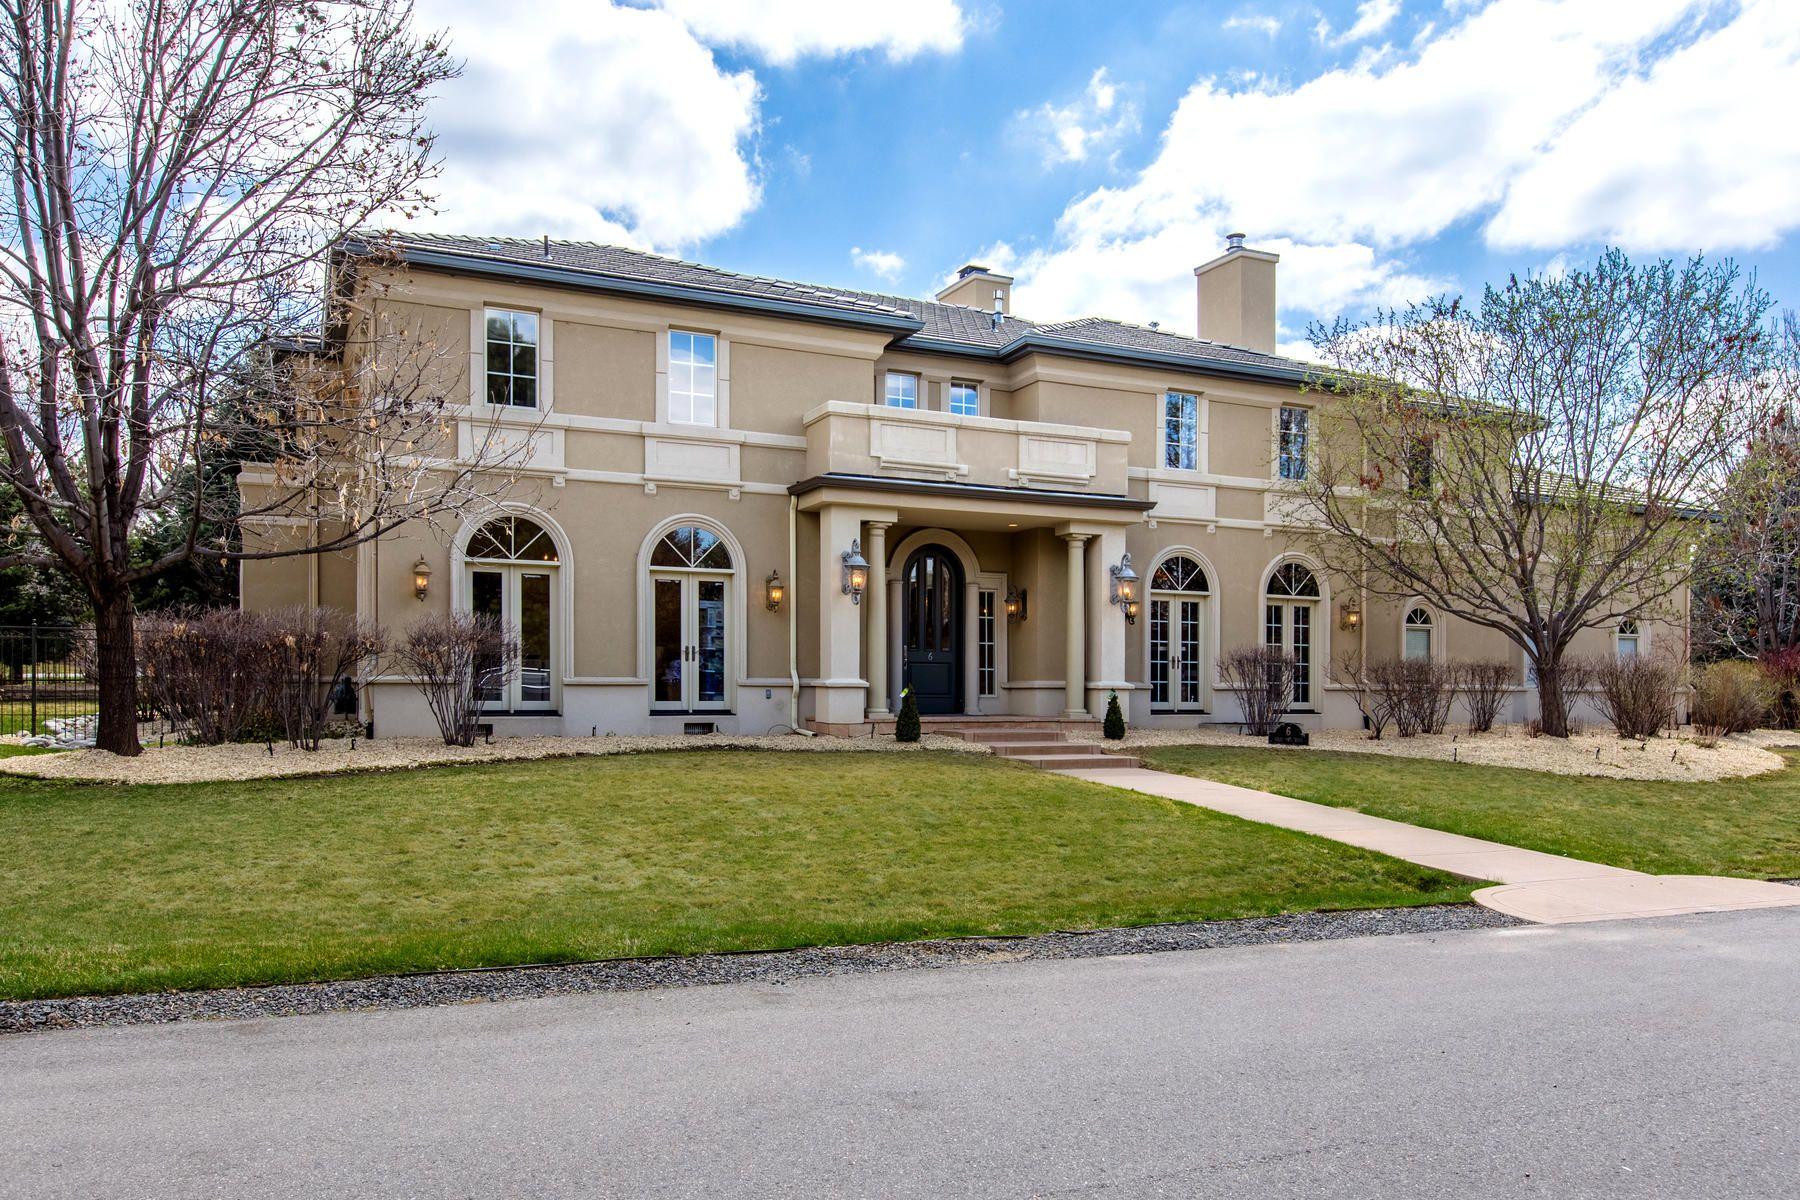 Single Family Homes для того Продажа на 6 Gray Owl Road, Cherry Hills Village, Co, 80113 Cherry Hills Village, Колорадо 80113 Соединенные Штаты